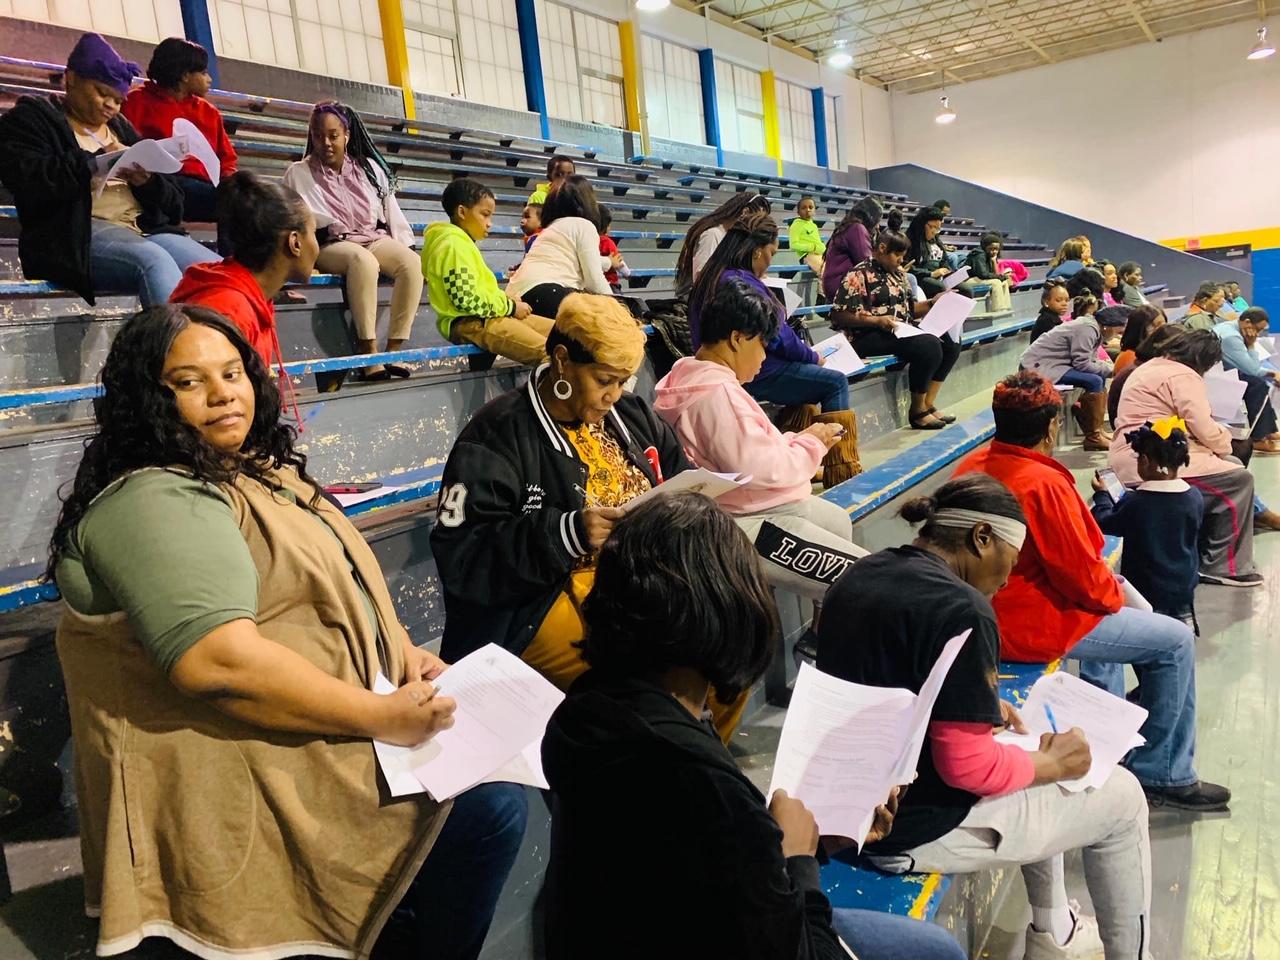 21st CCLC Parent Meeting